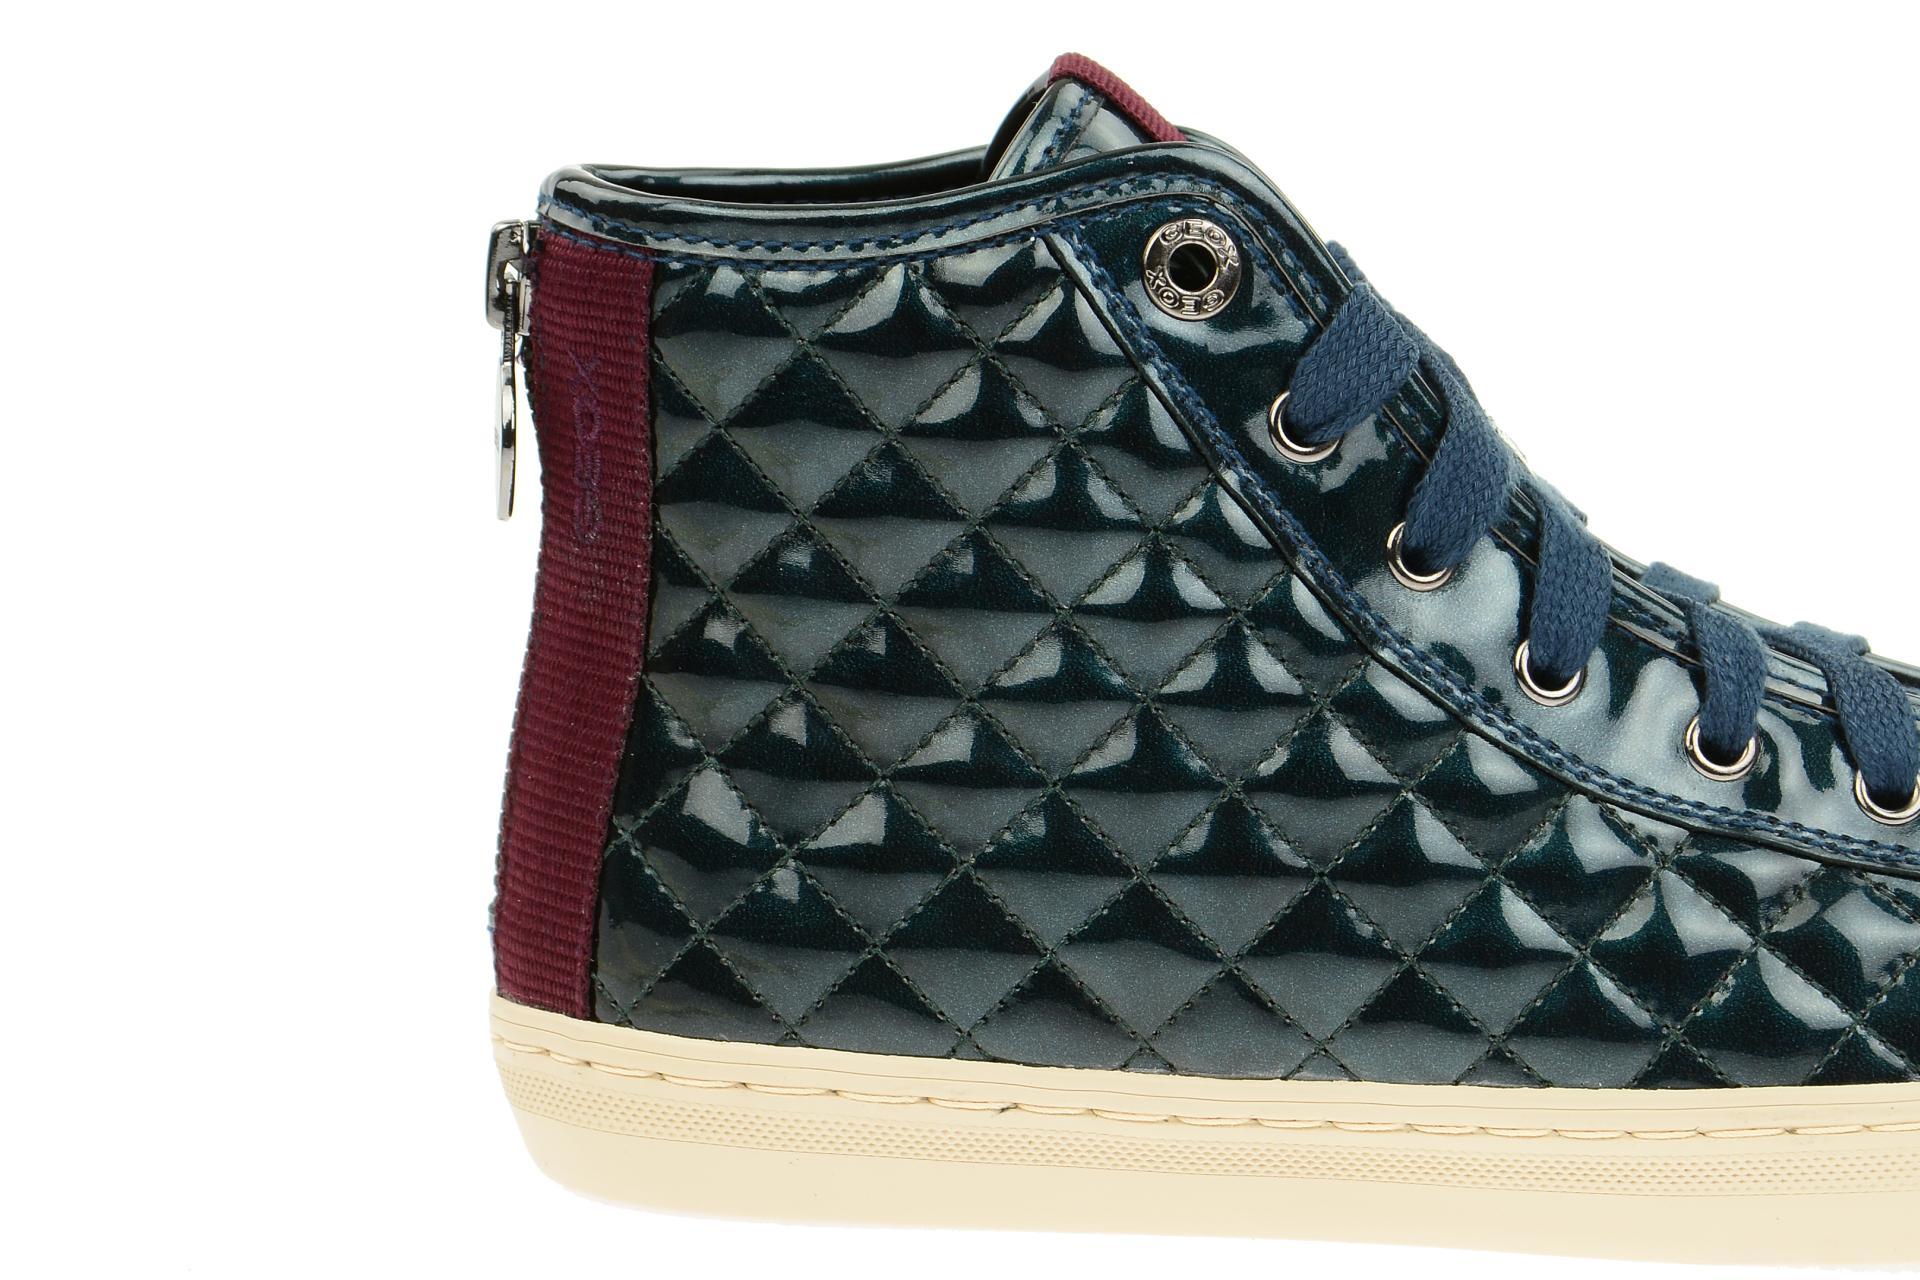 geox stiefelette new club damen sneakers blau metallic lack neu ebay. Black Bedroom Furniture Sets. Home Design Ideas